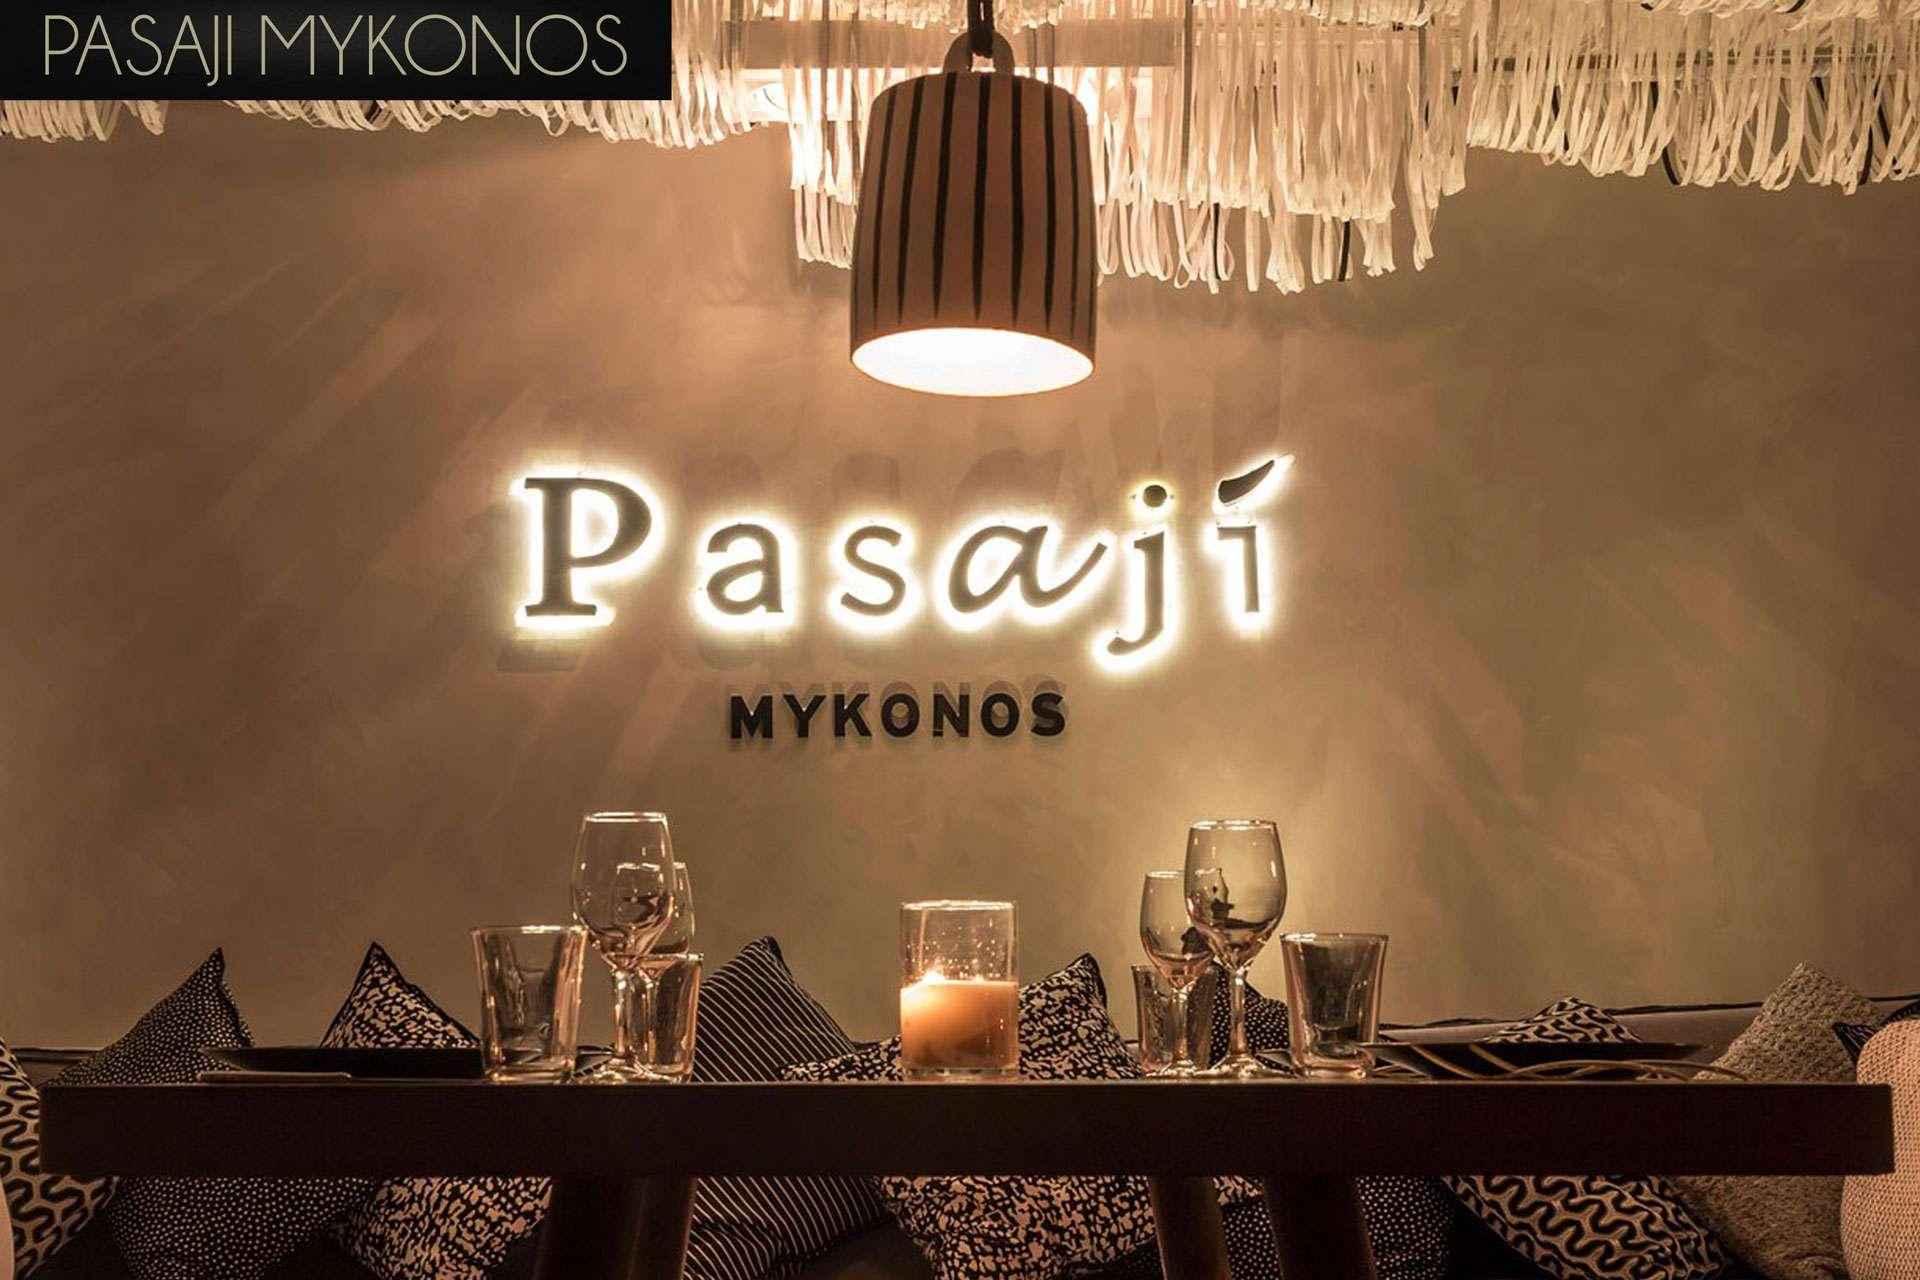 Pasaji Mykonos Restaurant